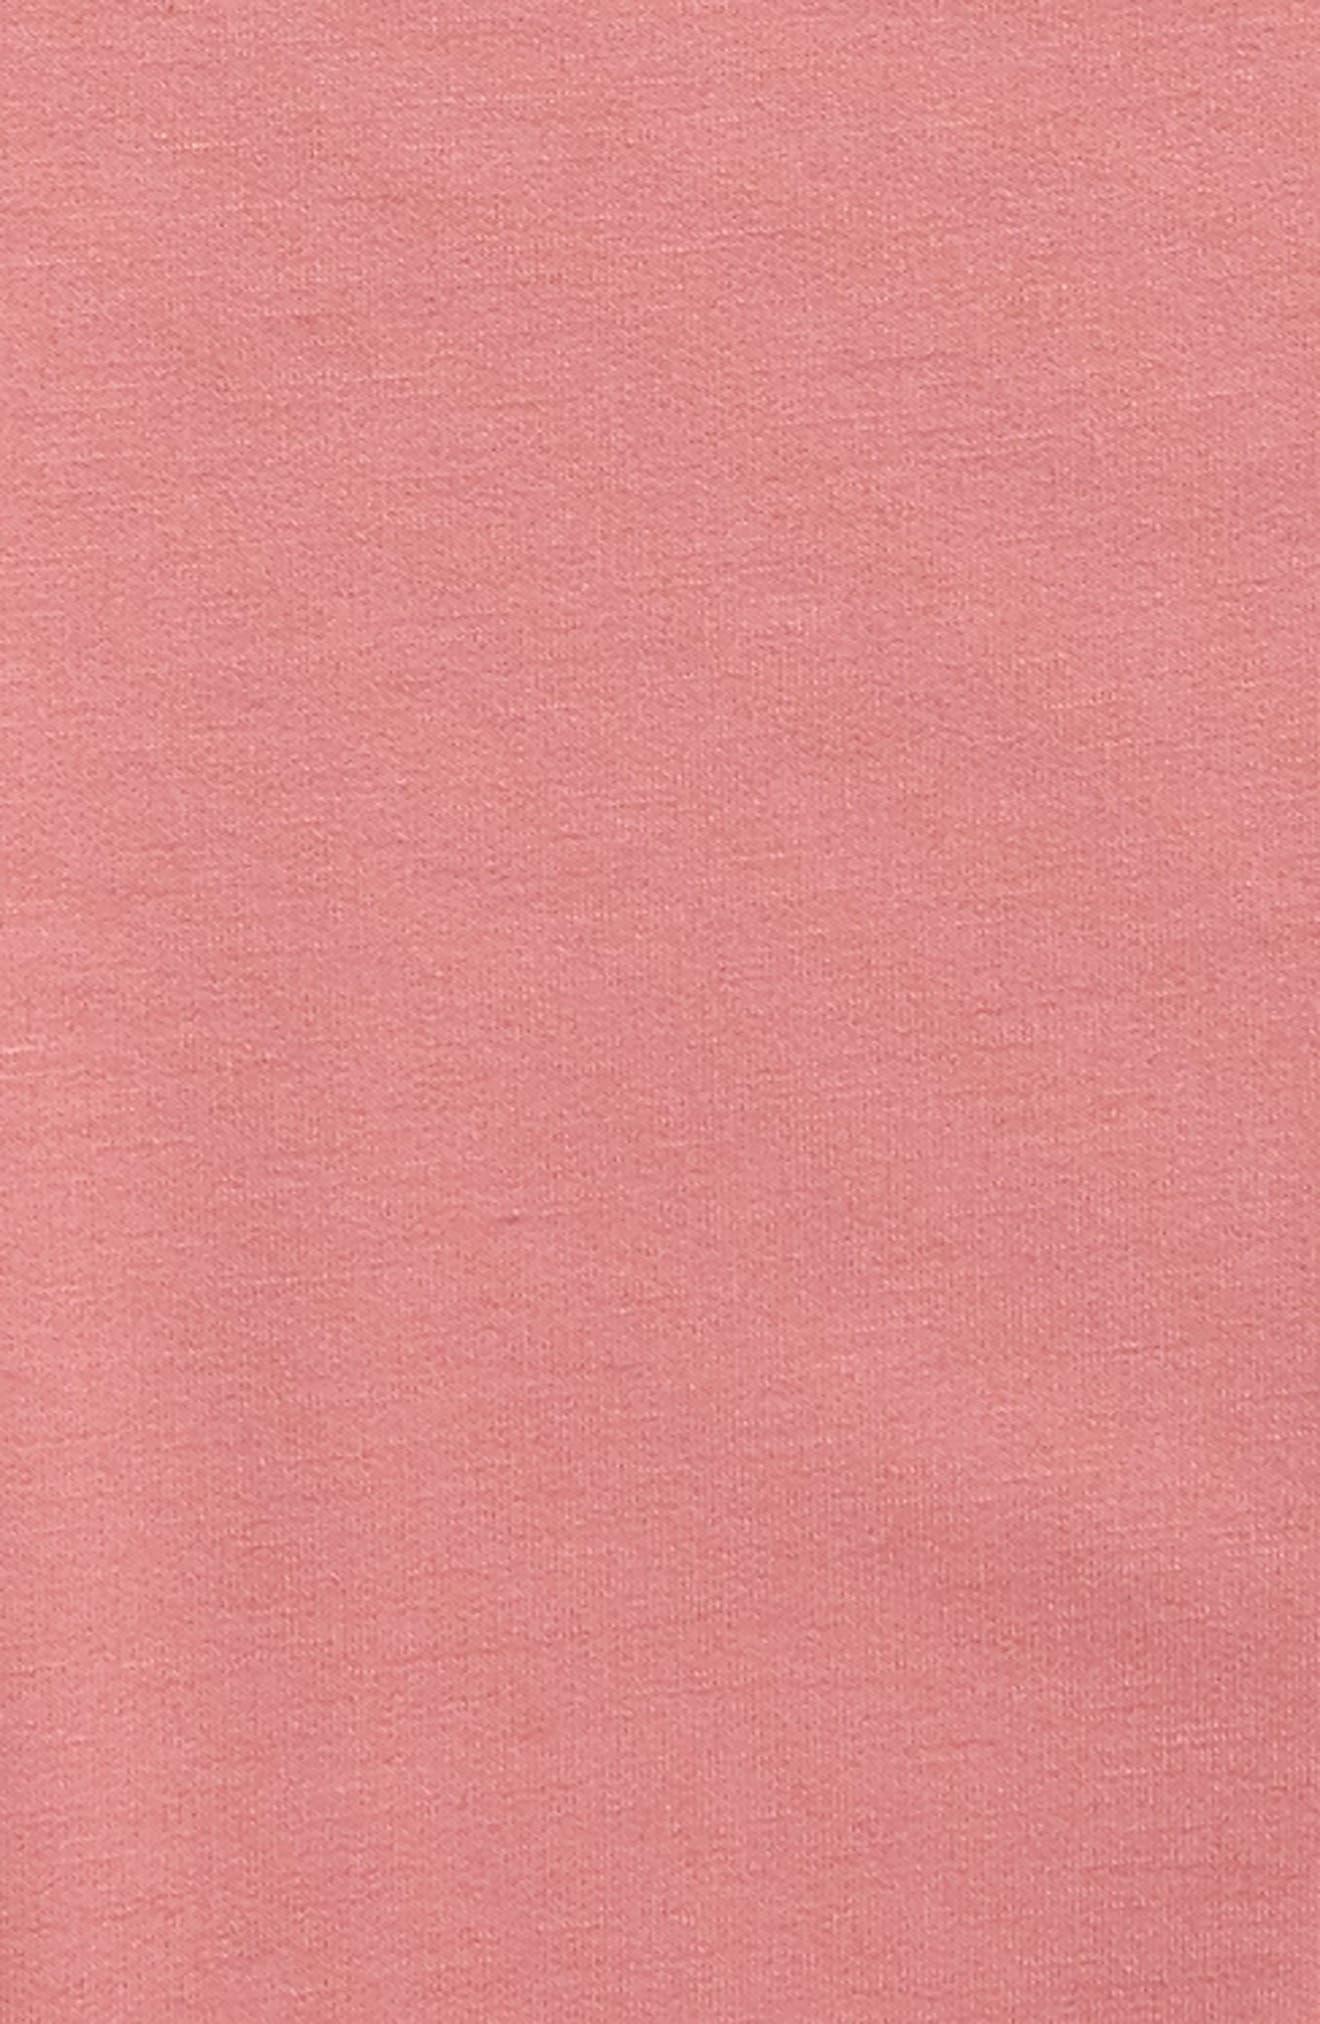 Tiered Sleeve Sweatshirt,                             Alternate thumbnail 2, color,                             551